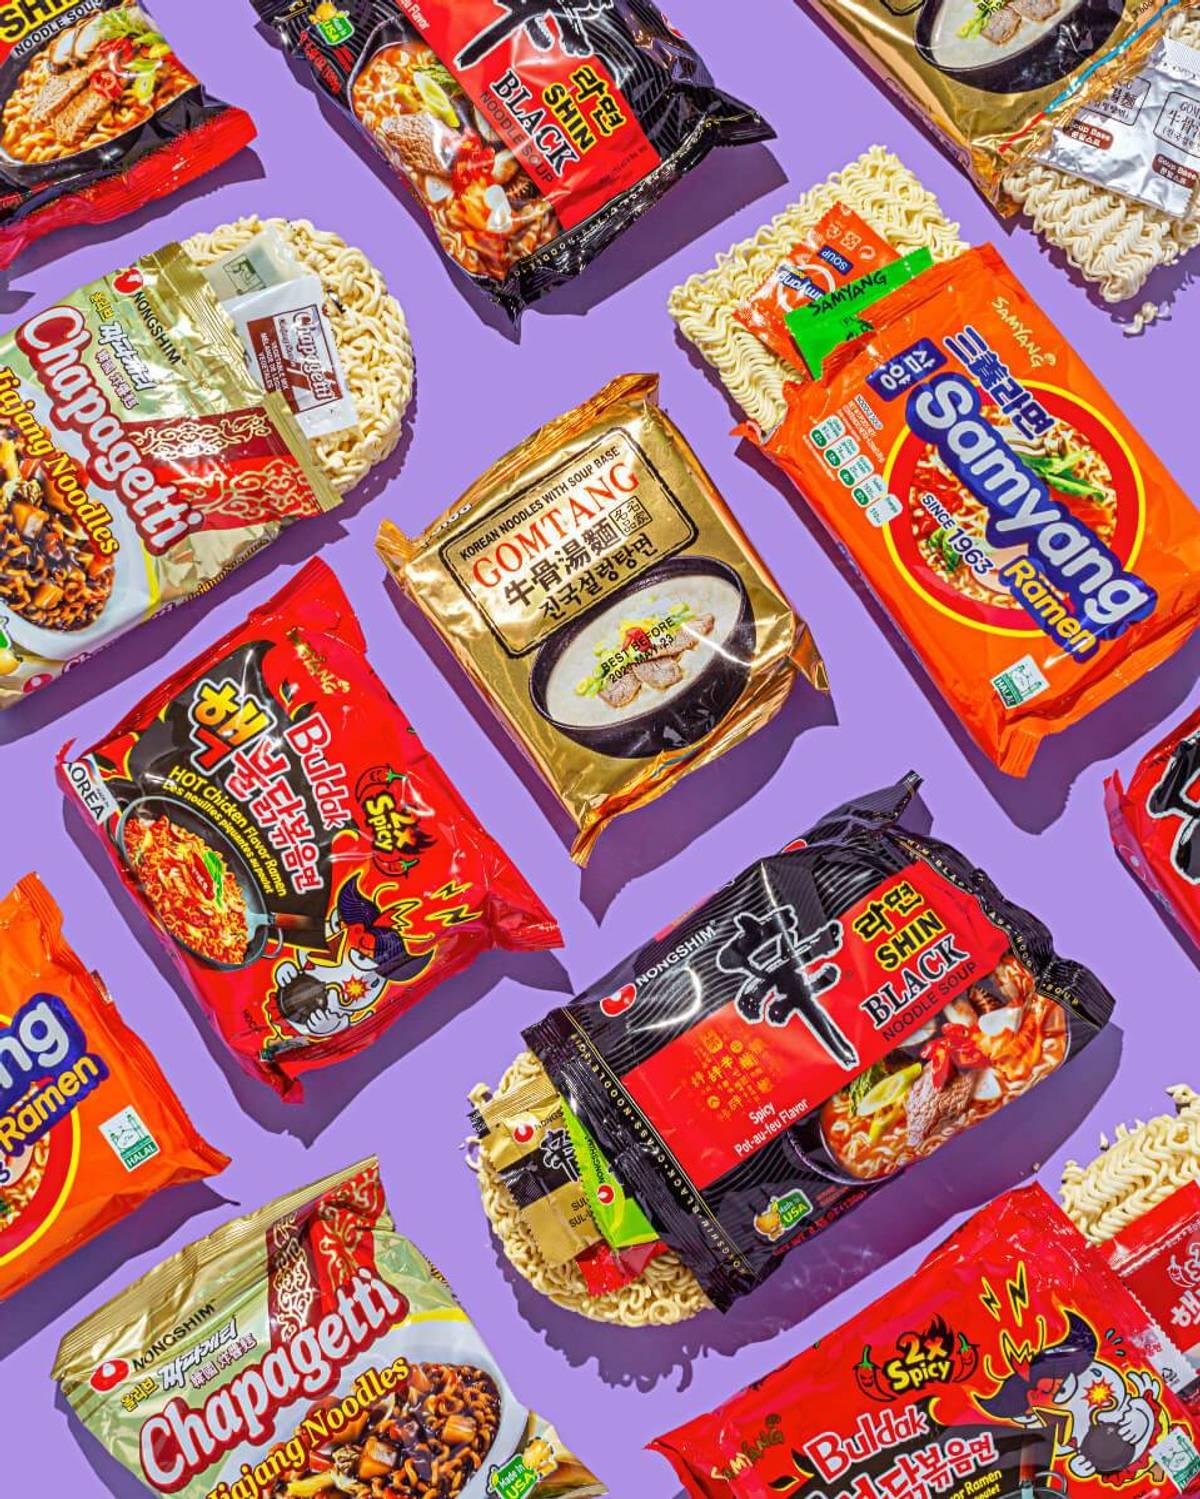 display of Umamicart snacks